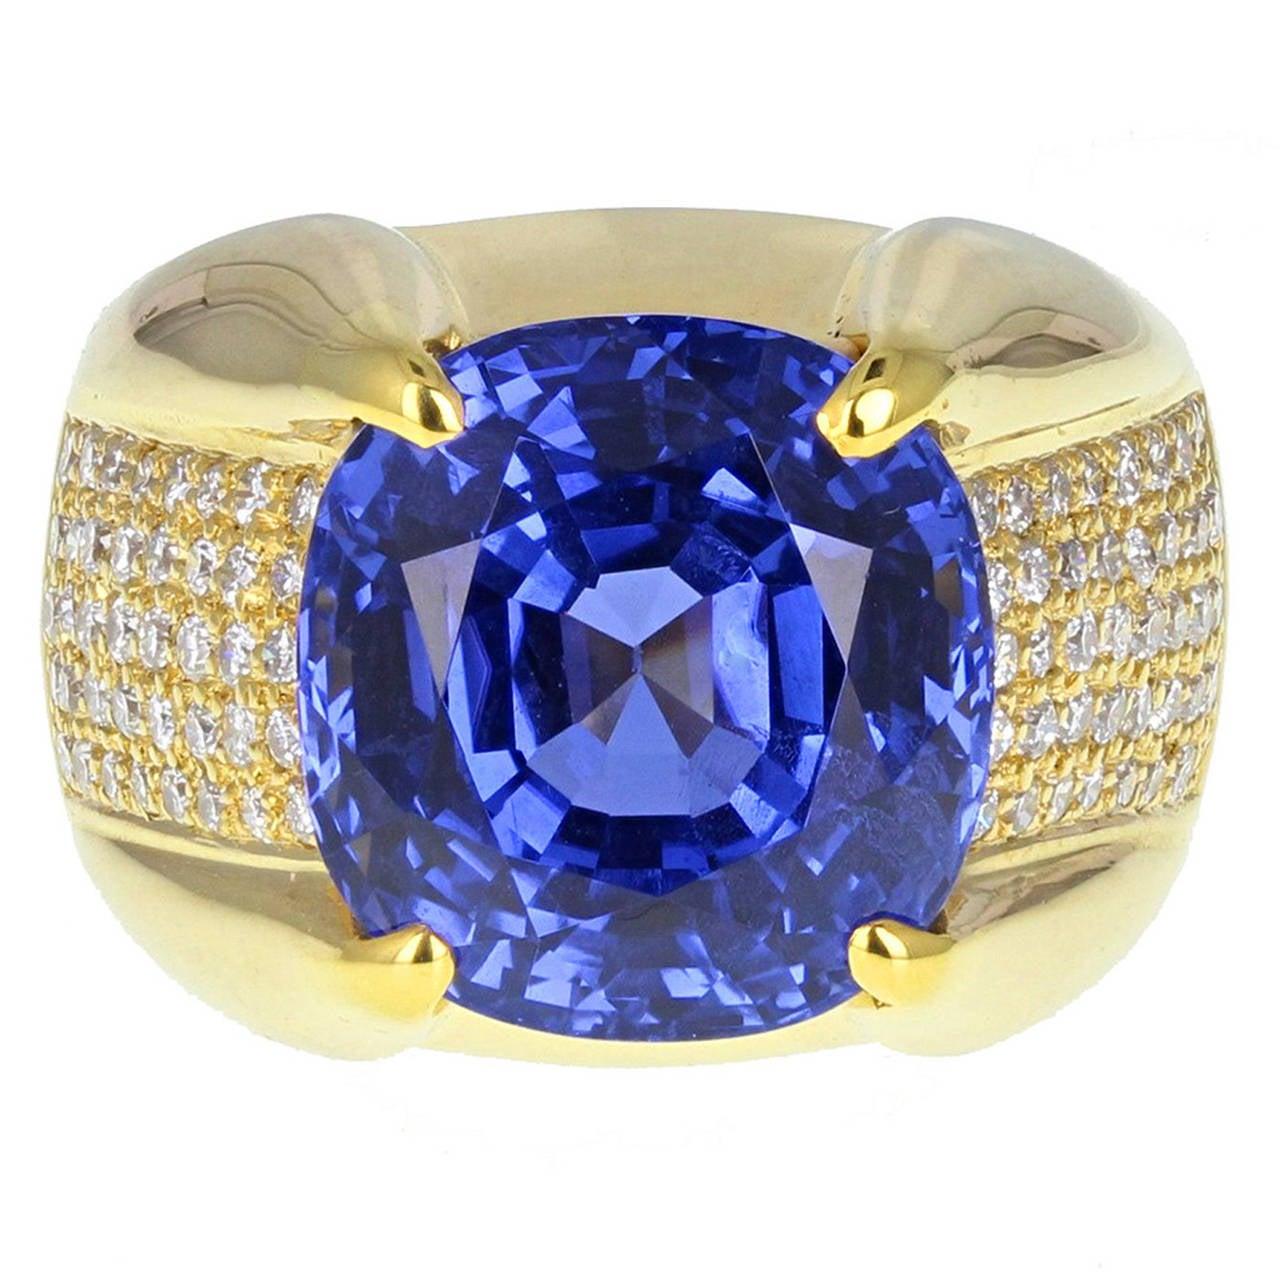 SSEF Certificated 13.18 Carat No Heat Ceylon Sapphire Diamond Cocktail Ring